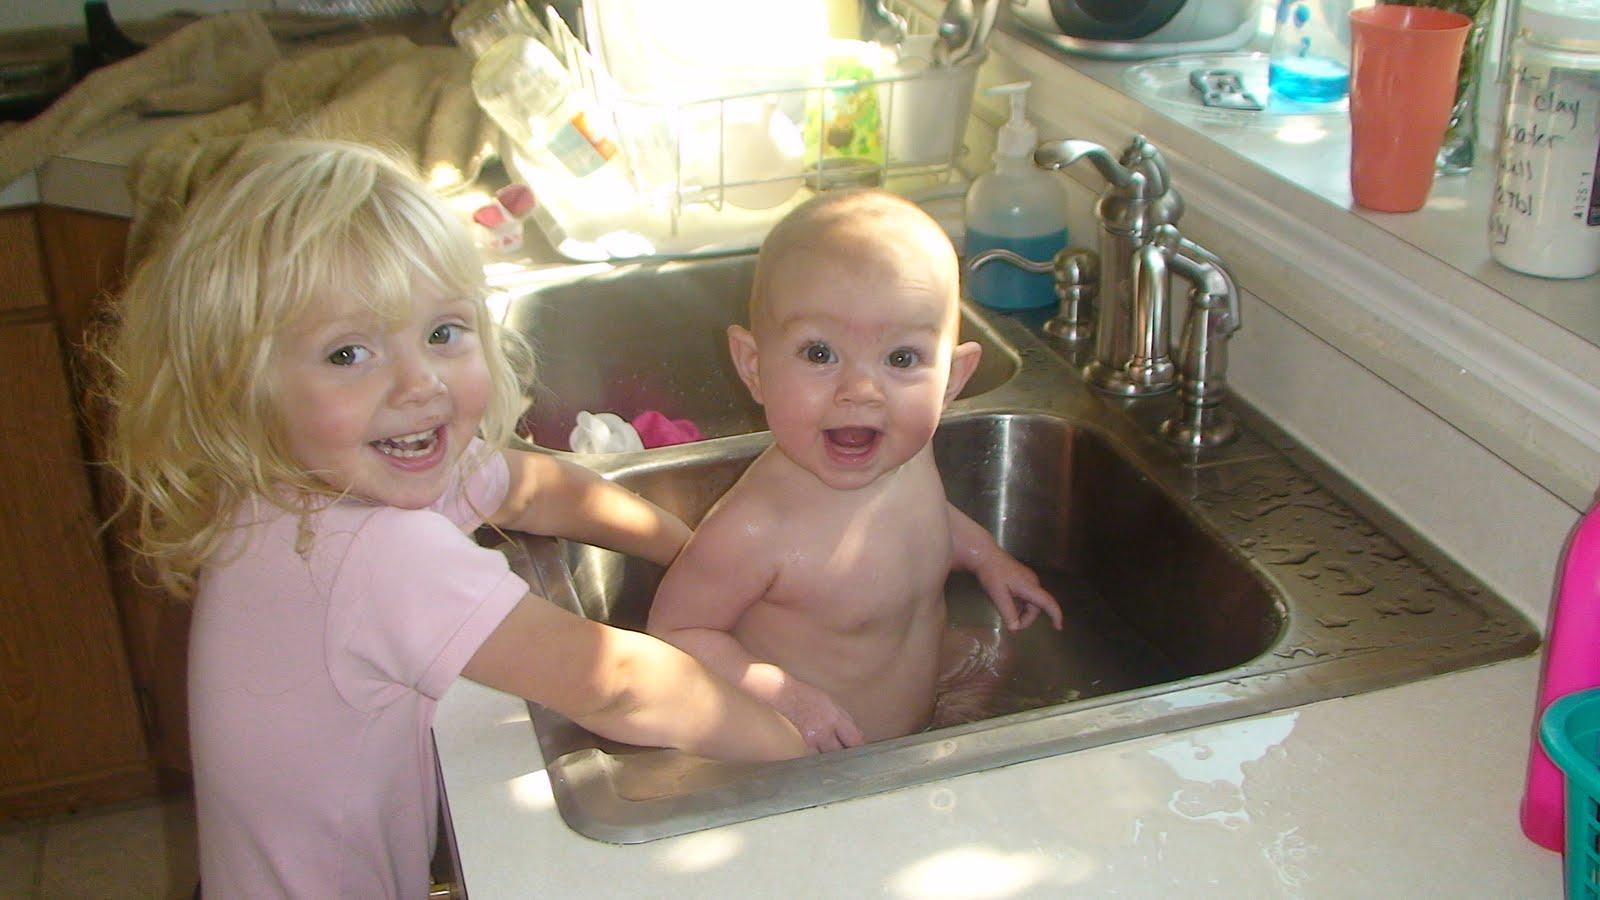 Twins Bathing In Kitchen Sink